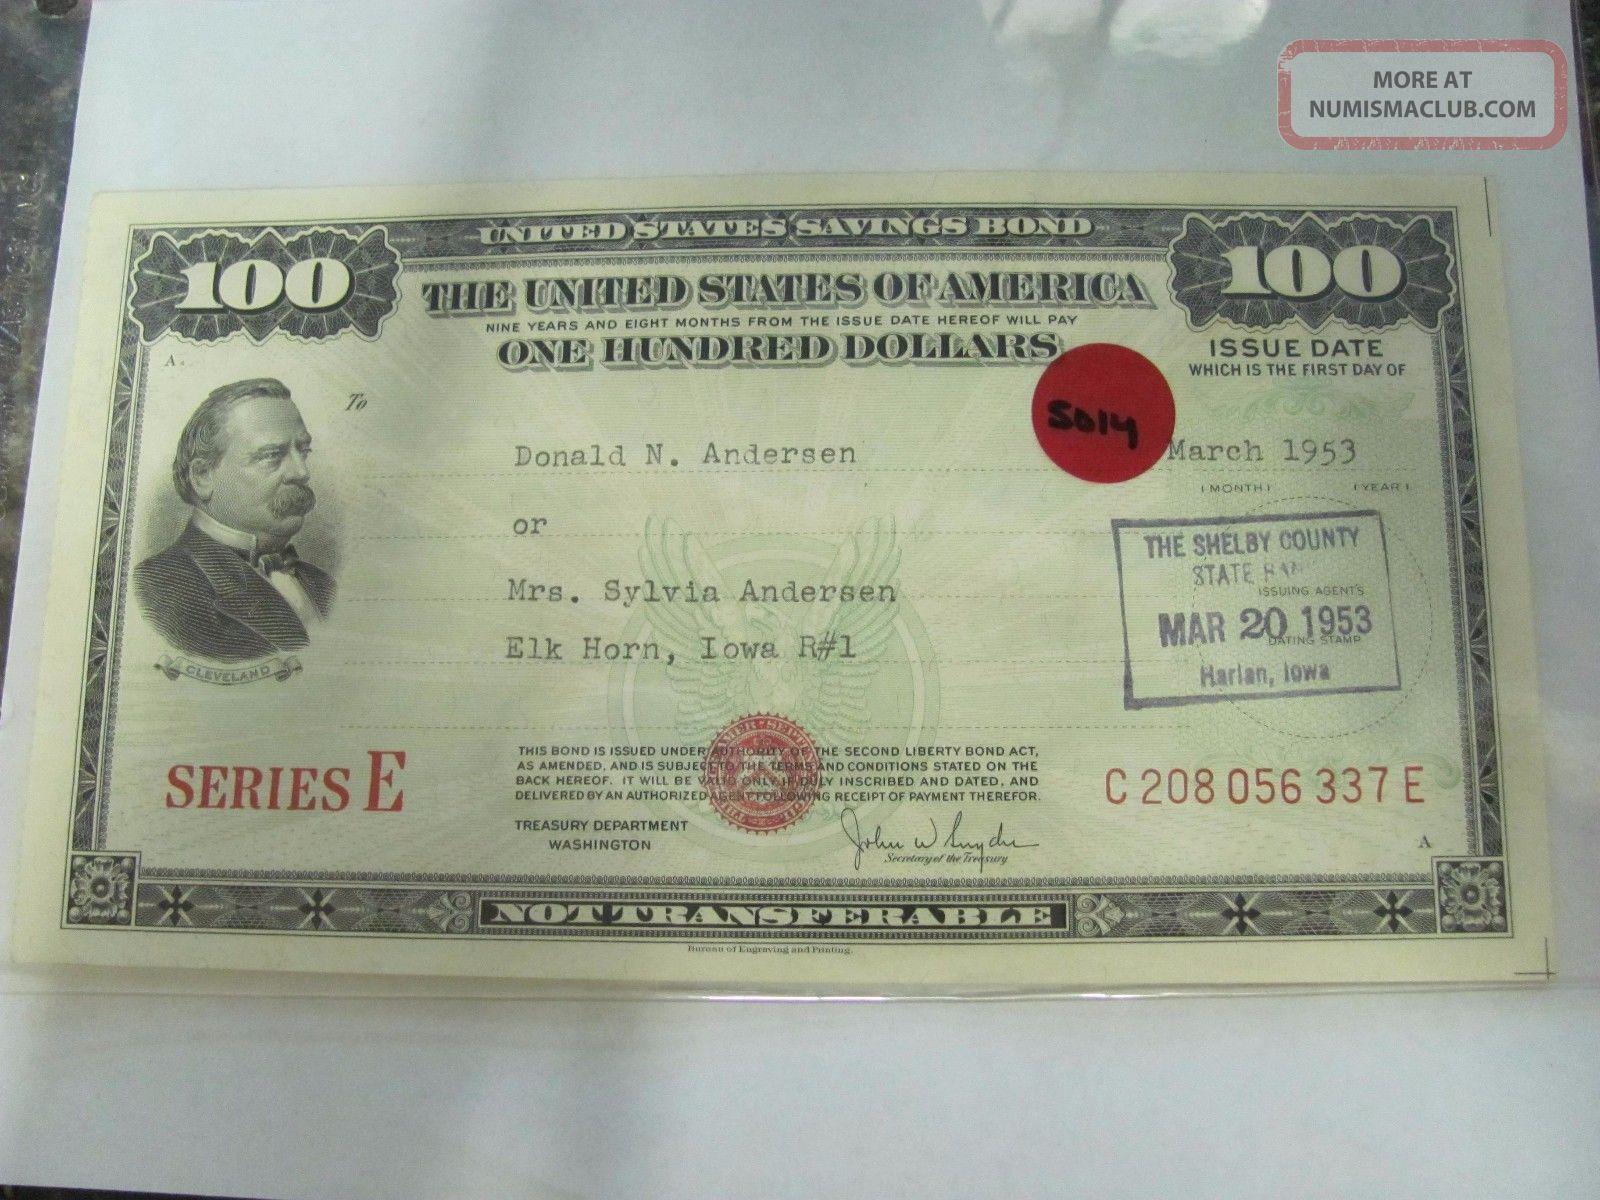 , 5014 Old Pawn 1953 $100 United States Savings Bond Series E Stocks & Bonds, Scripophily photo